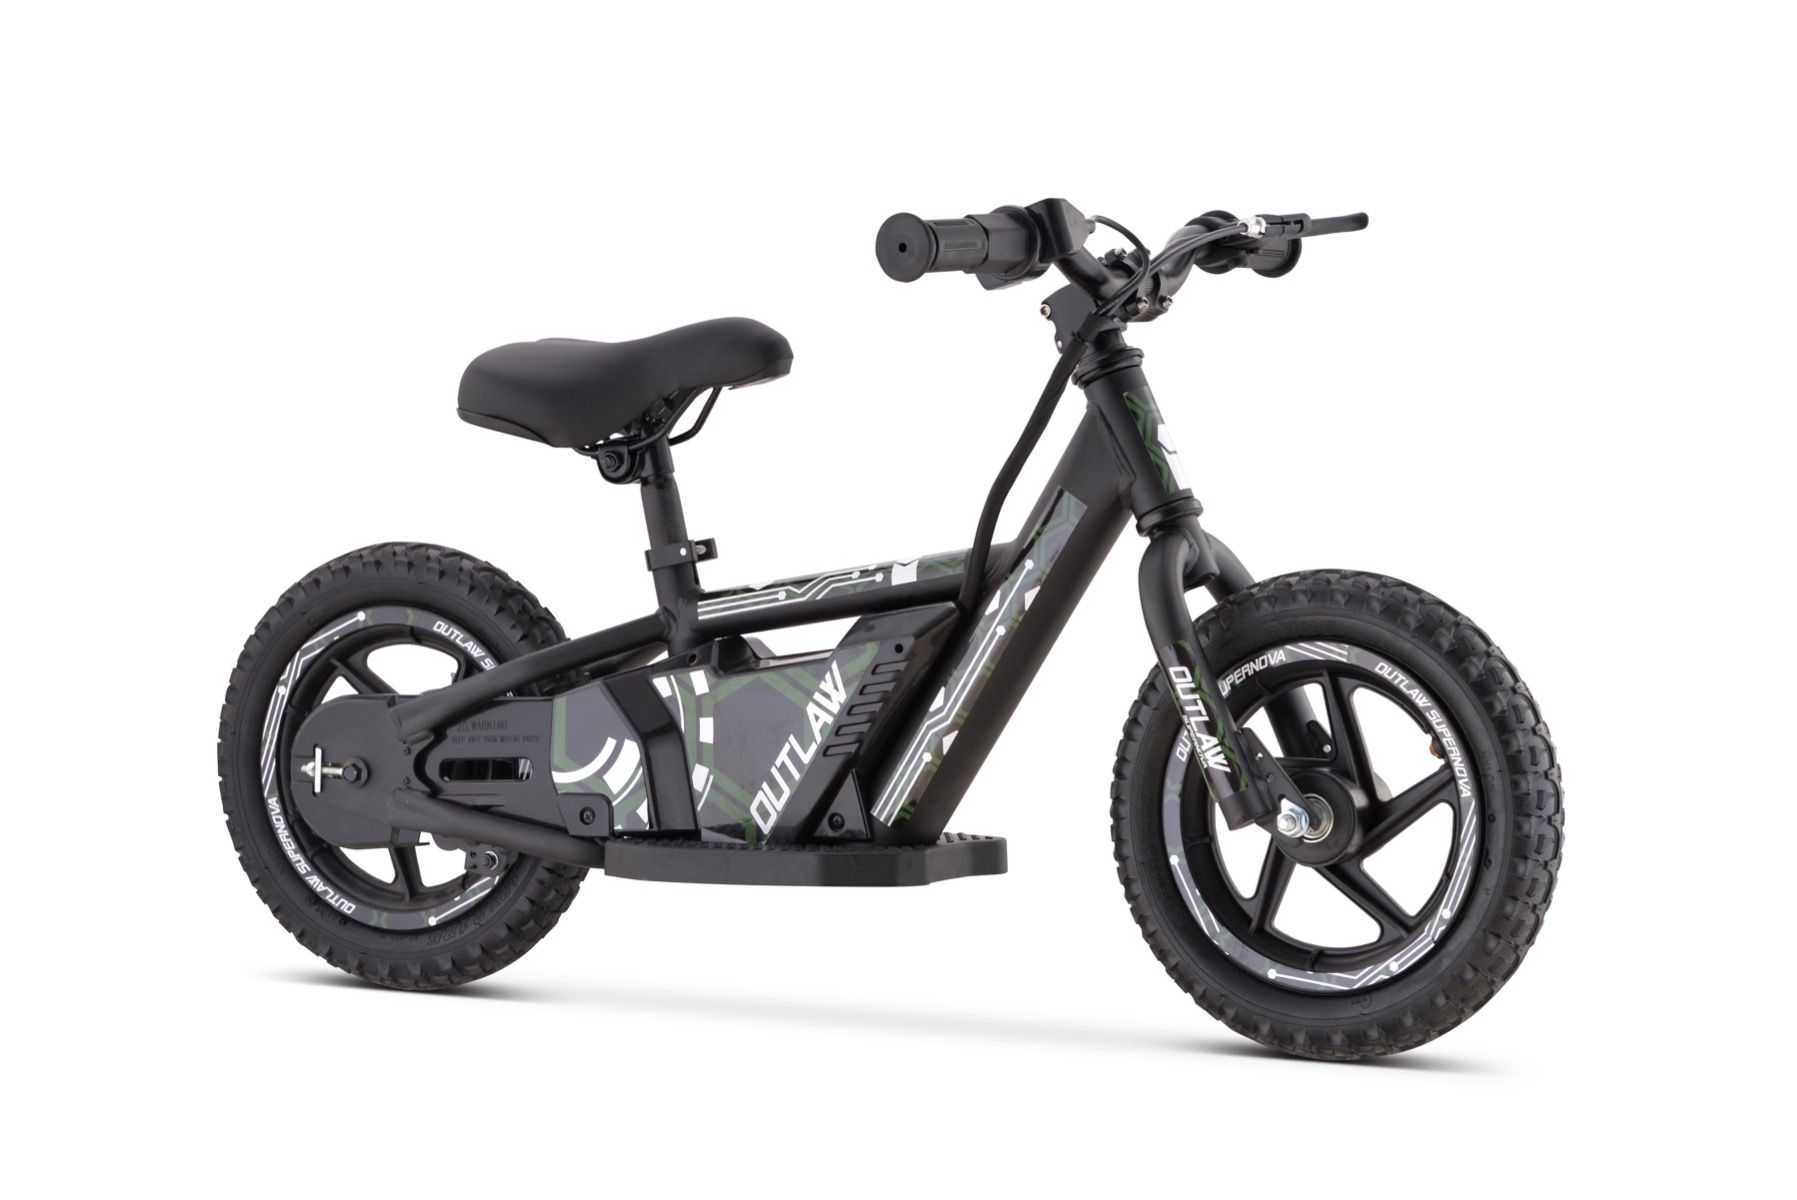 "Outlaw elektrische loopfiets 24V lithium met 16"" wielen - groen"